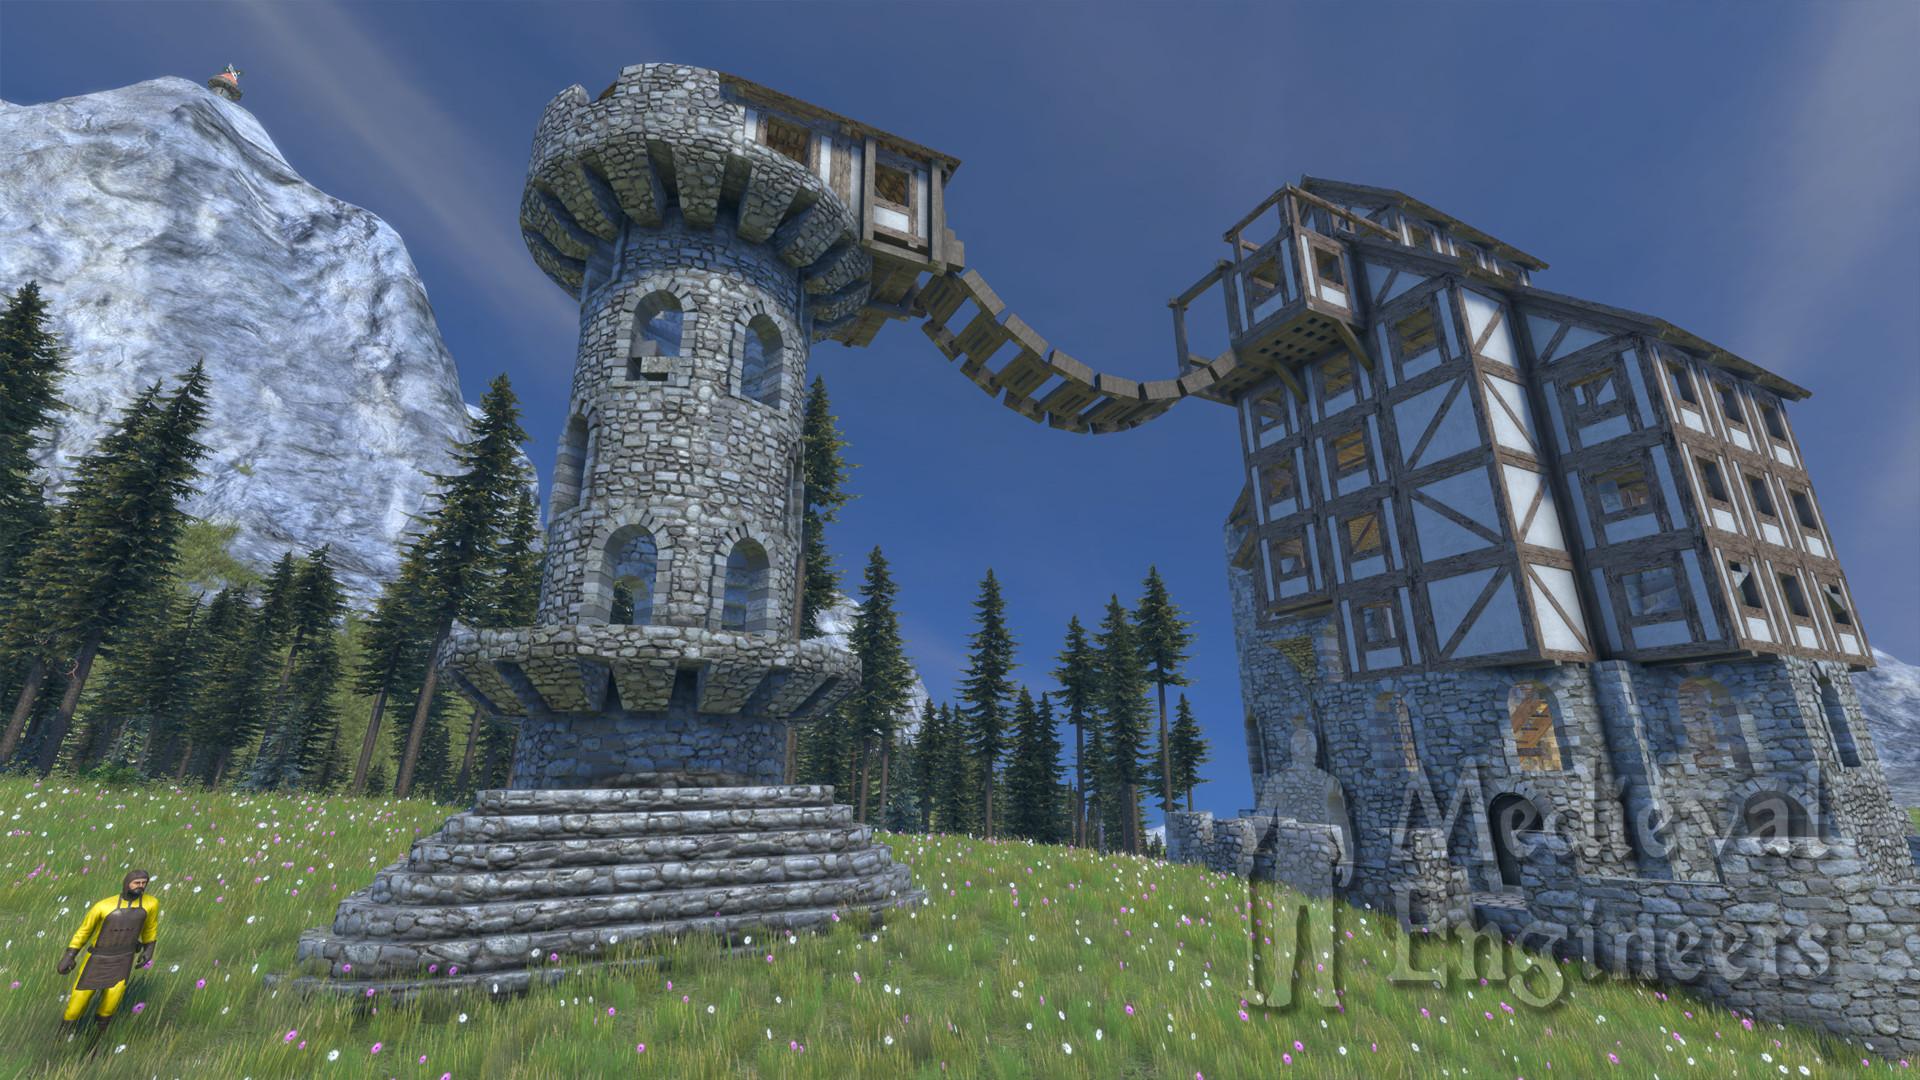 Medieval Engineers Deluxe Edtion v0.4.3.91833 Cracked-3DM скачать торрент